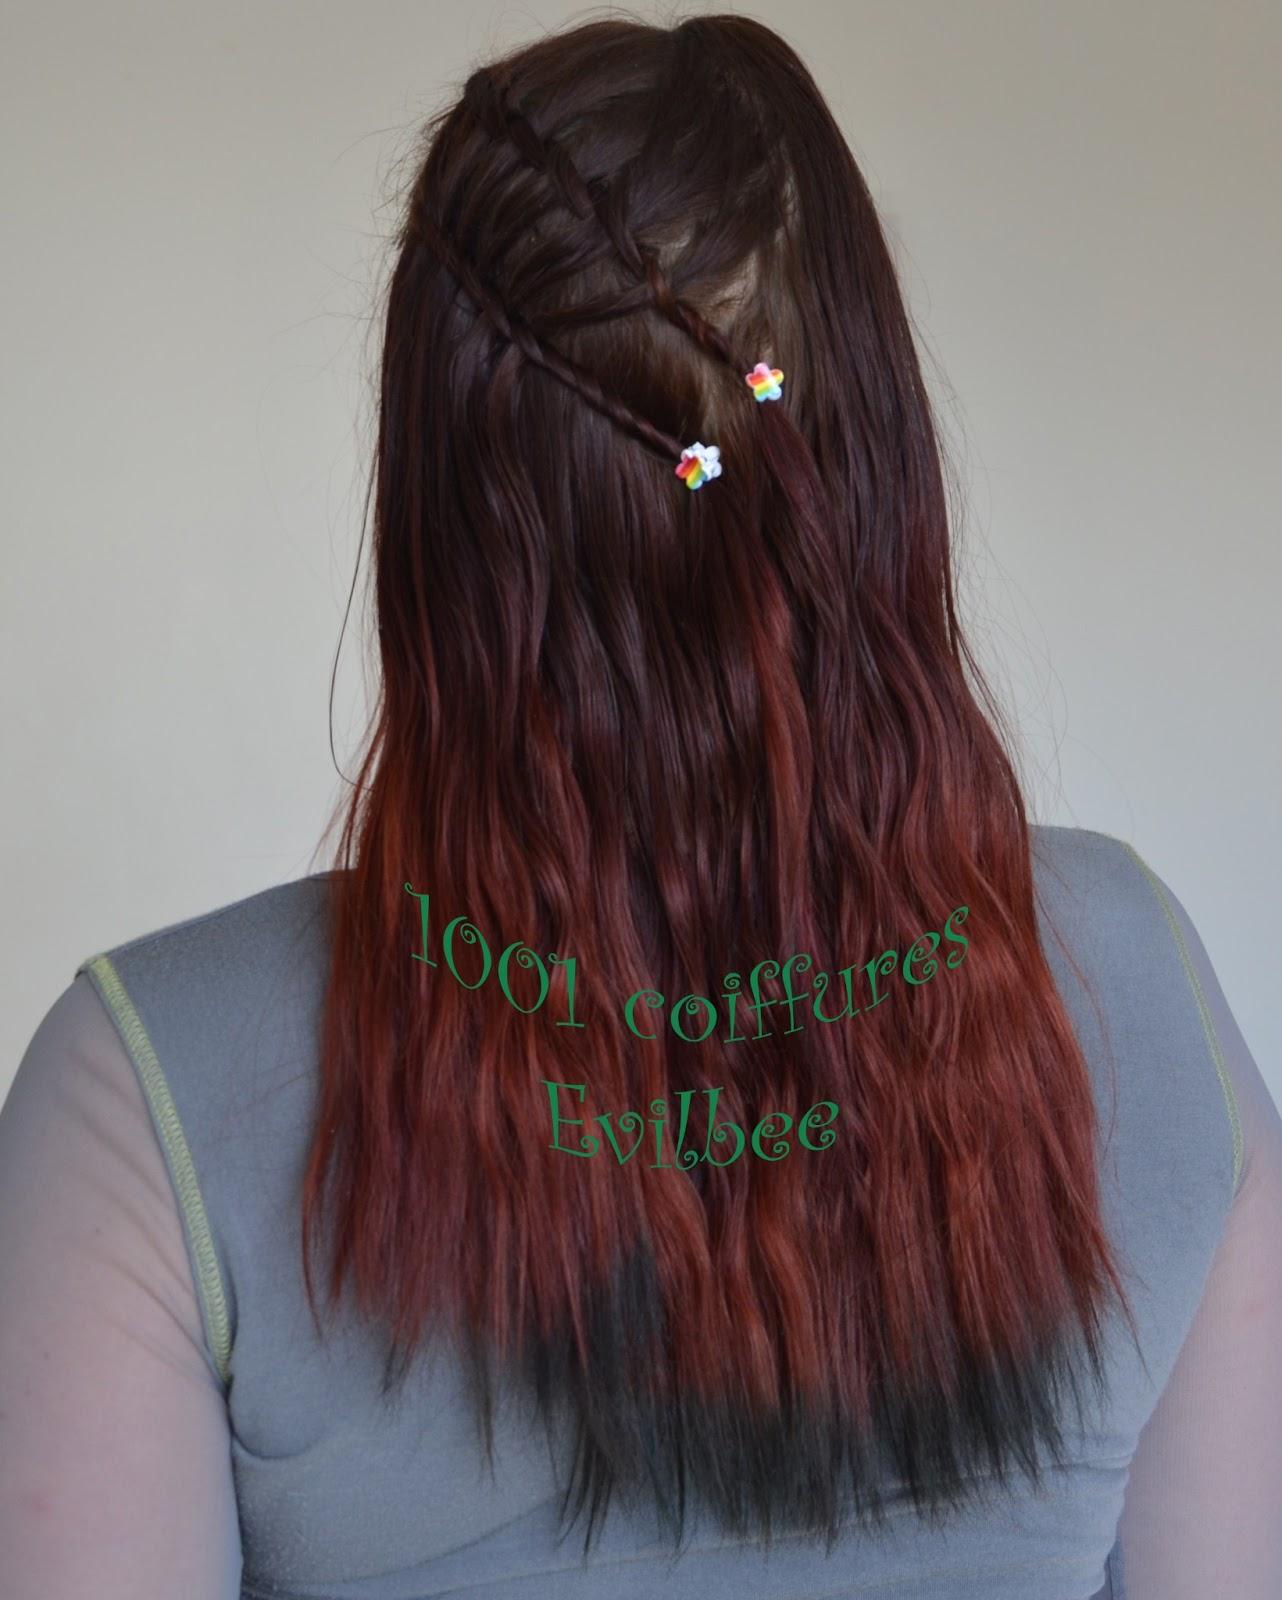 1001 coiffures tuto 2 waterfall braids 2 brins tresse en cascade - Tresse en cascade ...